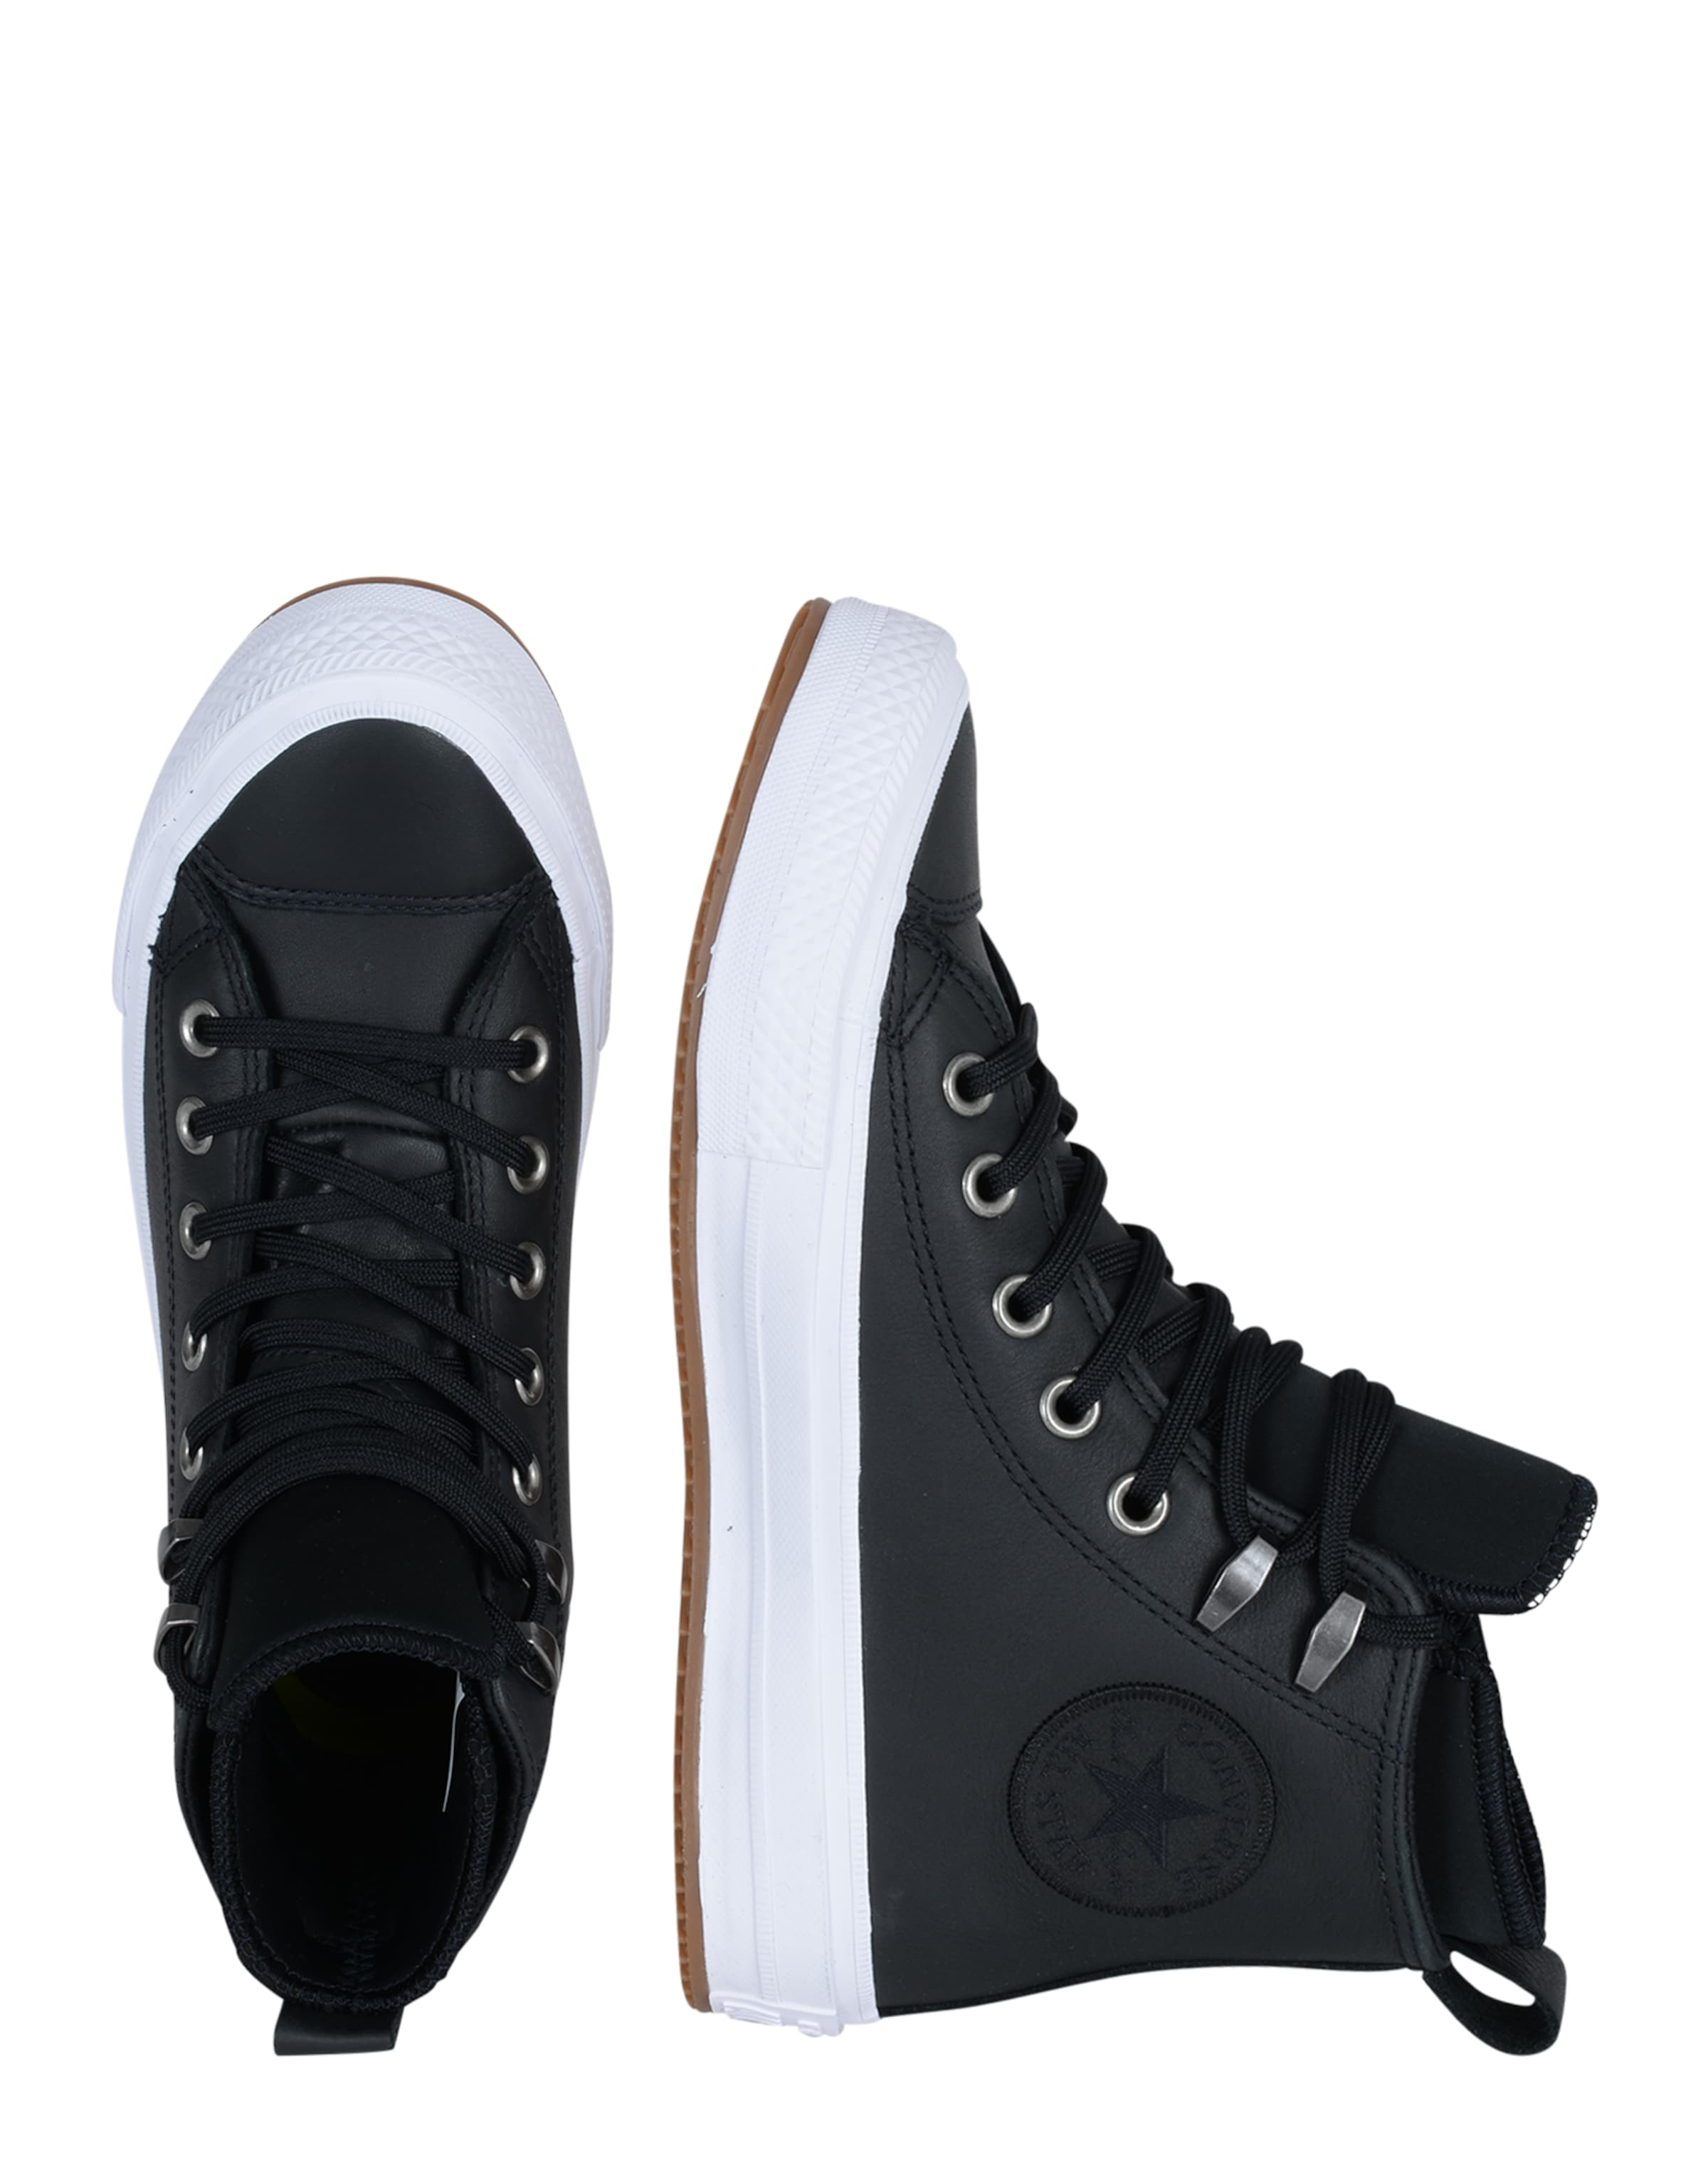 CONVERSE Hohe Sneaker 'All Star' Rabatt Footlocker Bilder oUoHCeLF2